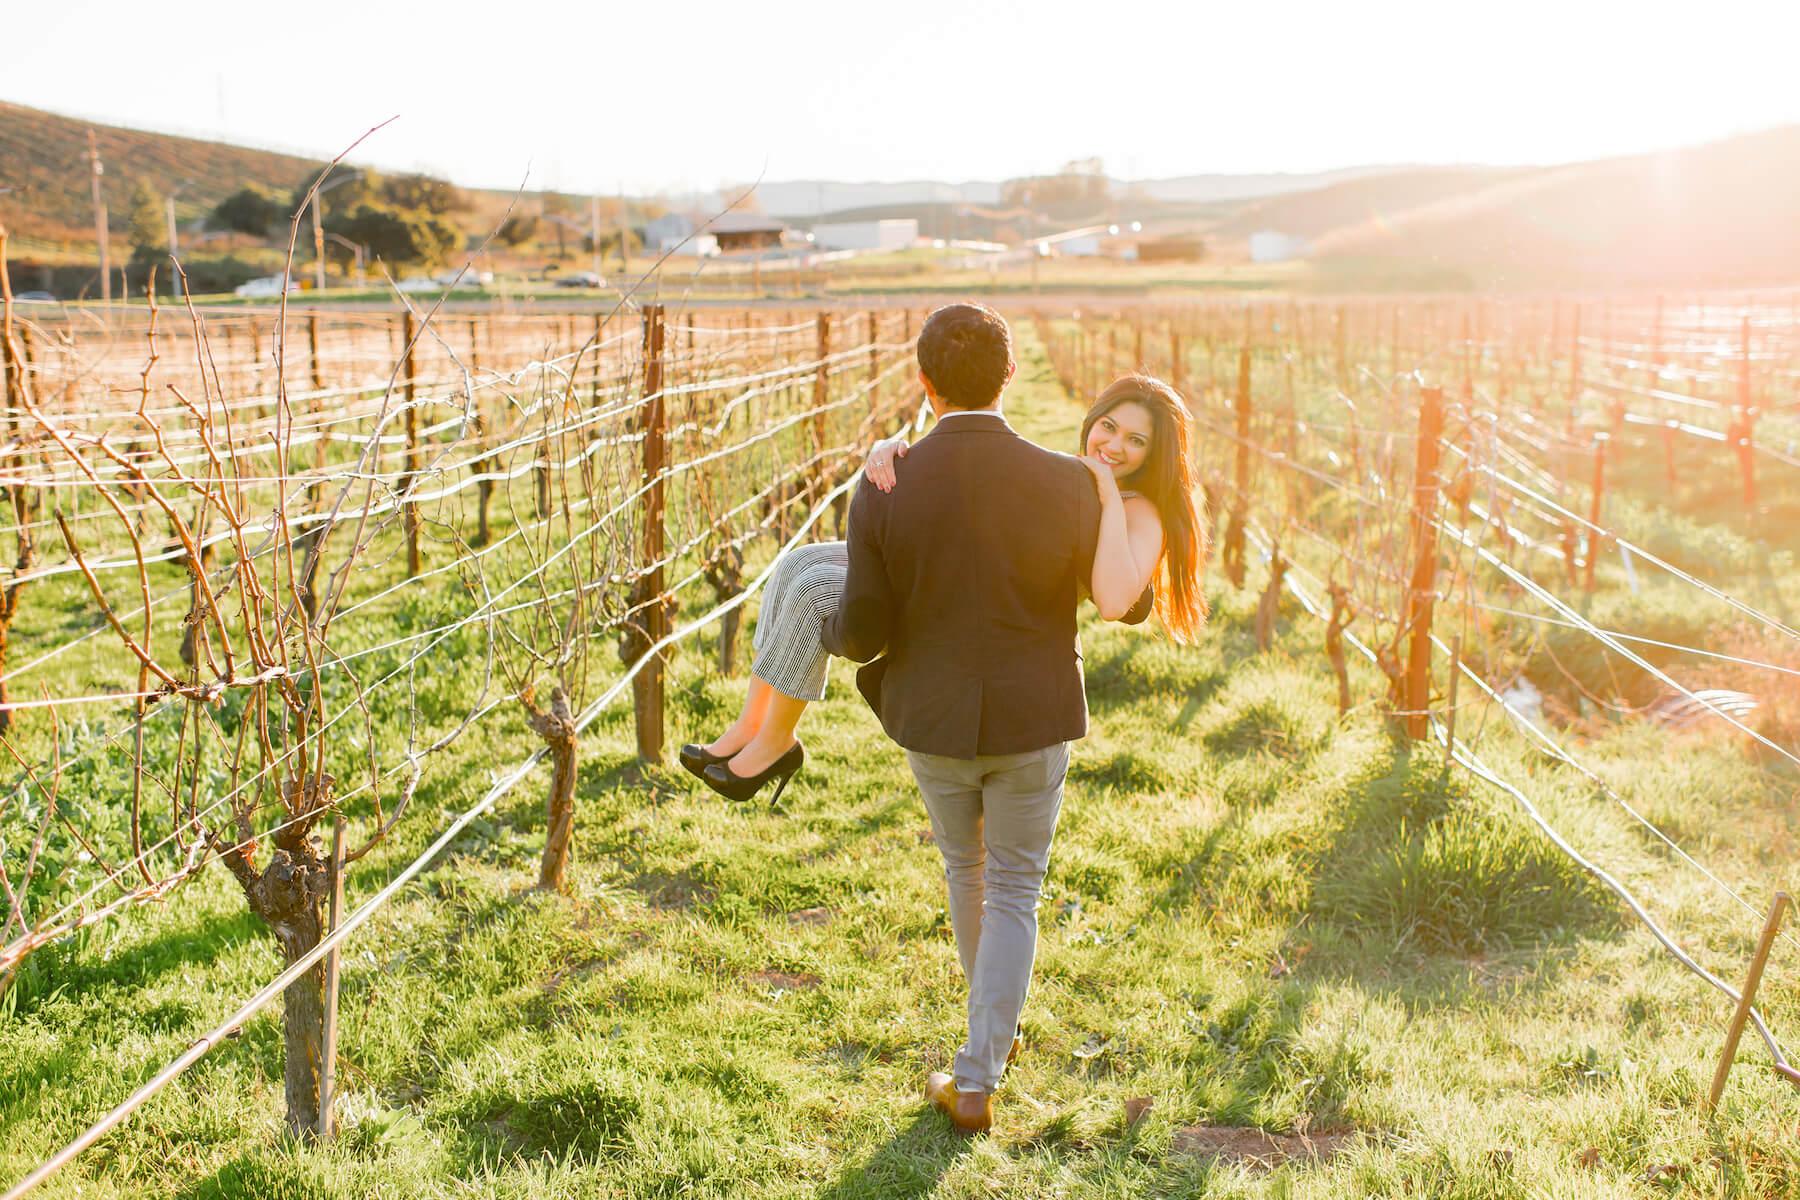 napa-sonoma-02-10-2020-couples-trip-114_original